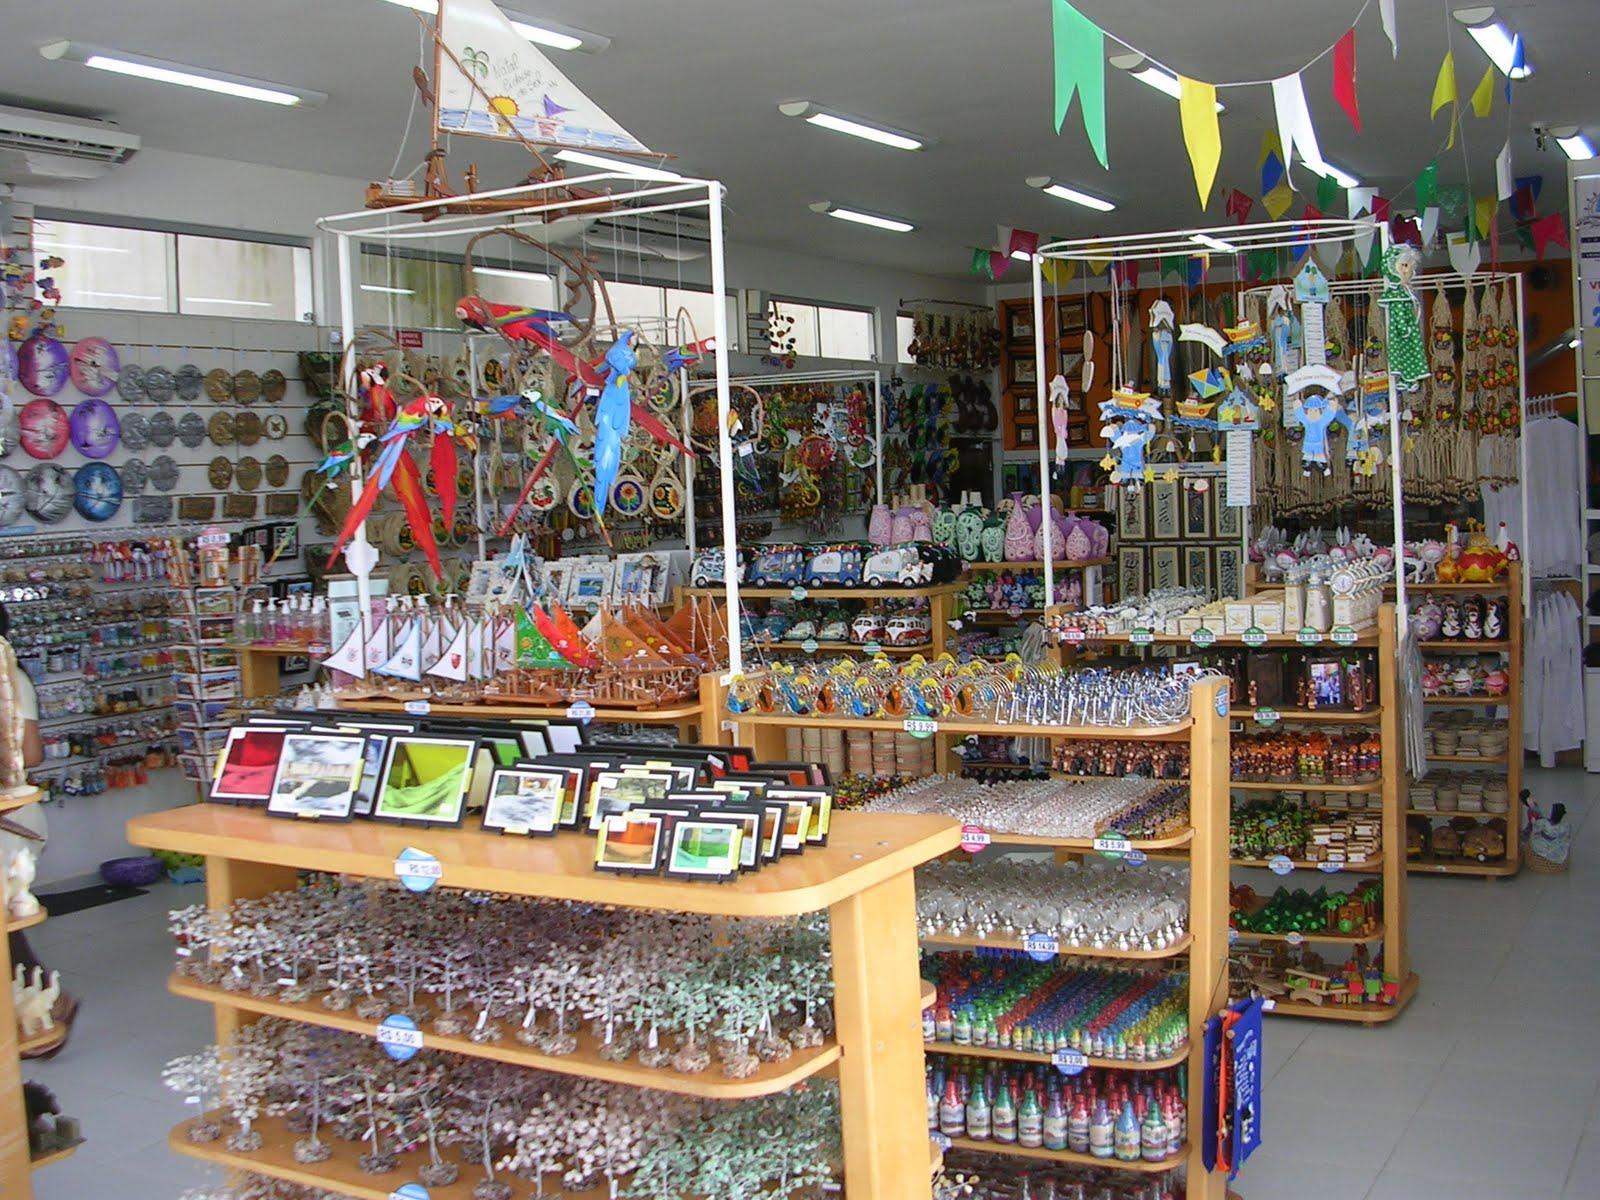 Armario Para Ropa Blanca ~ Cariocando por aí  Natal Artesanatos, cores e histórias